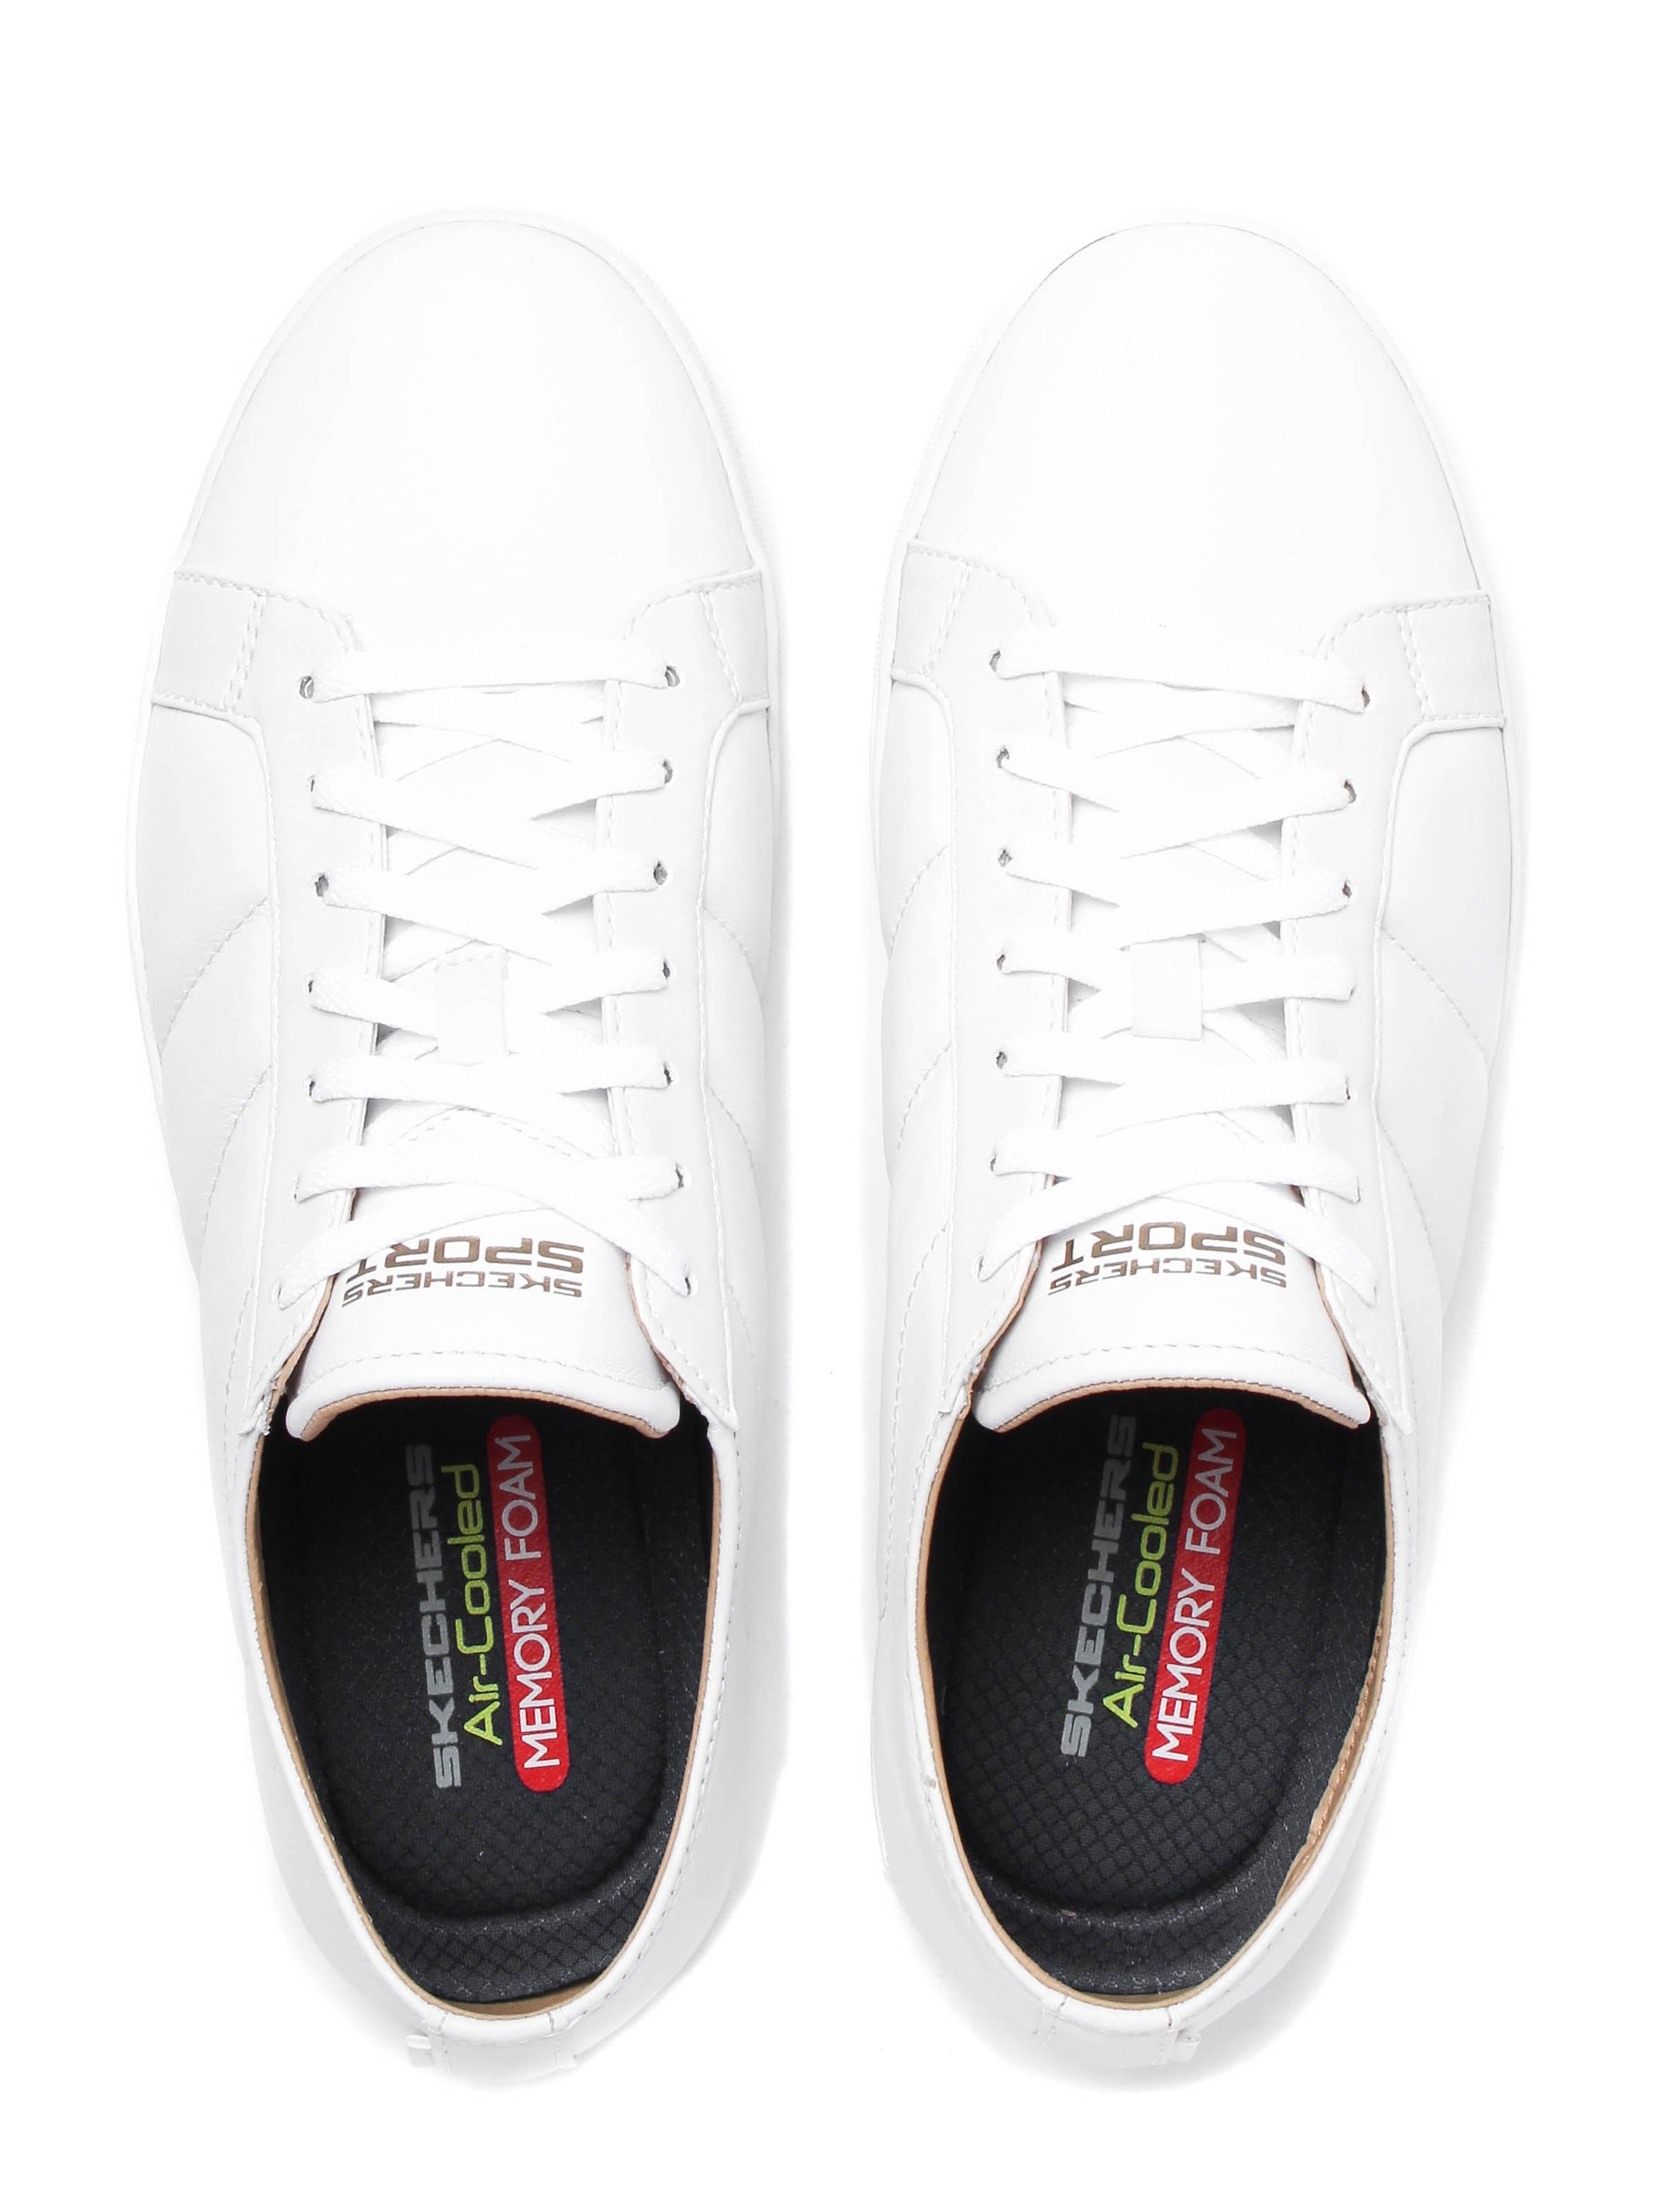 Skechers Men's Venice T Trainers - White Leather